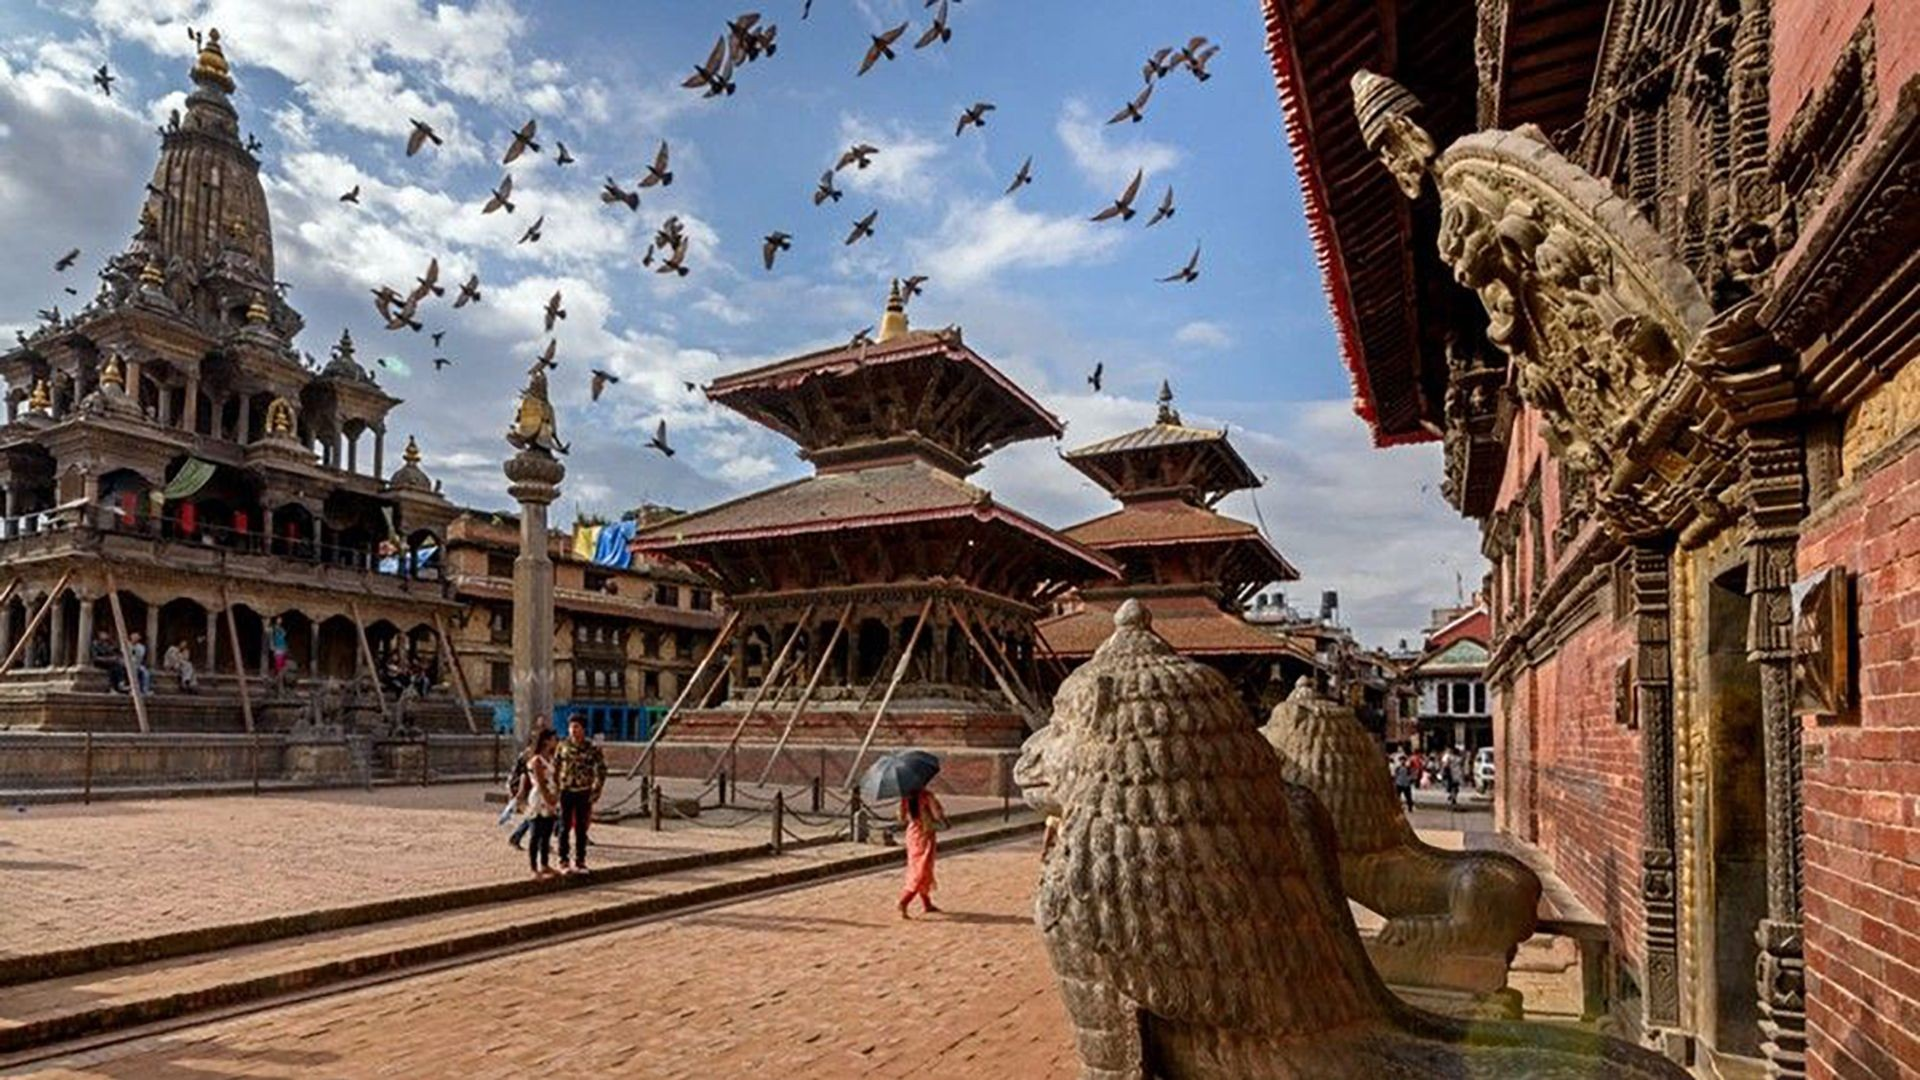 Stepping into Kathmandu